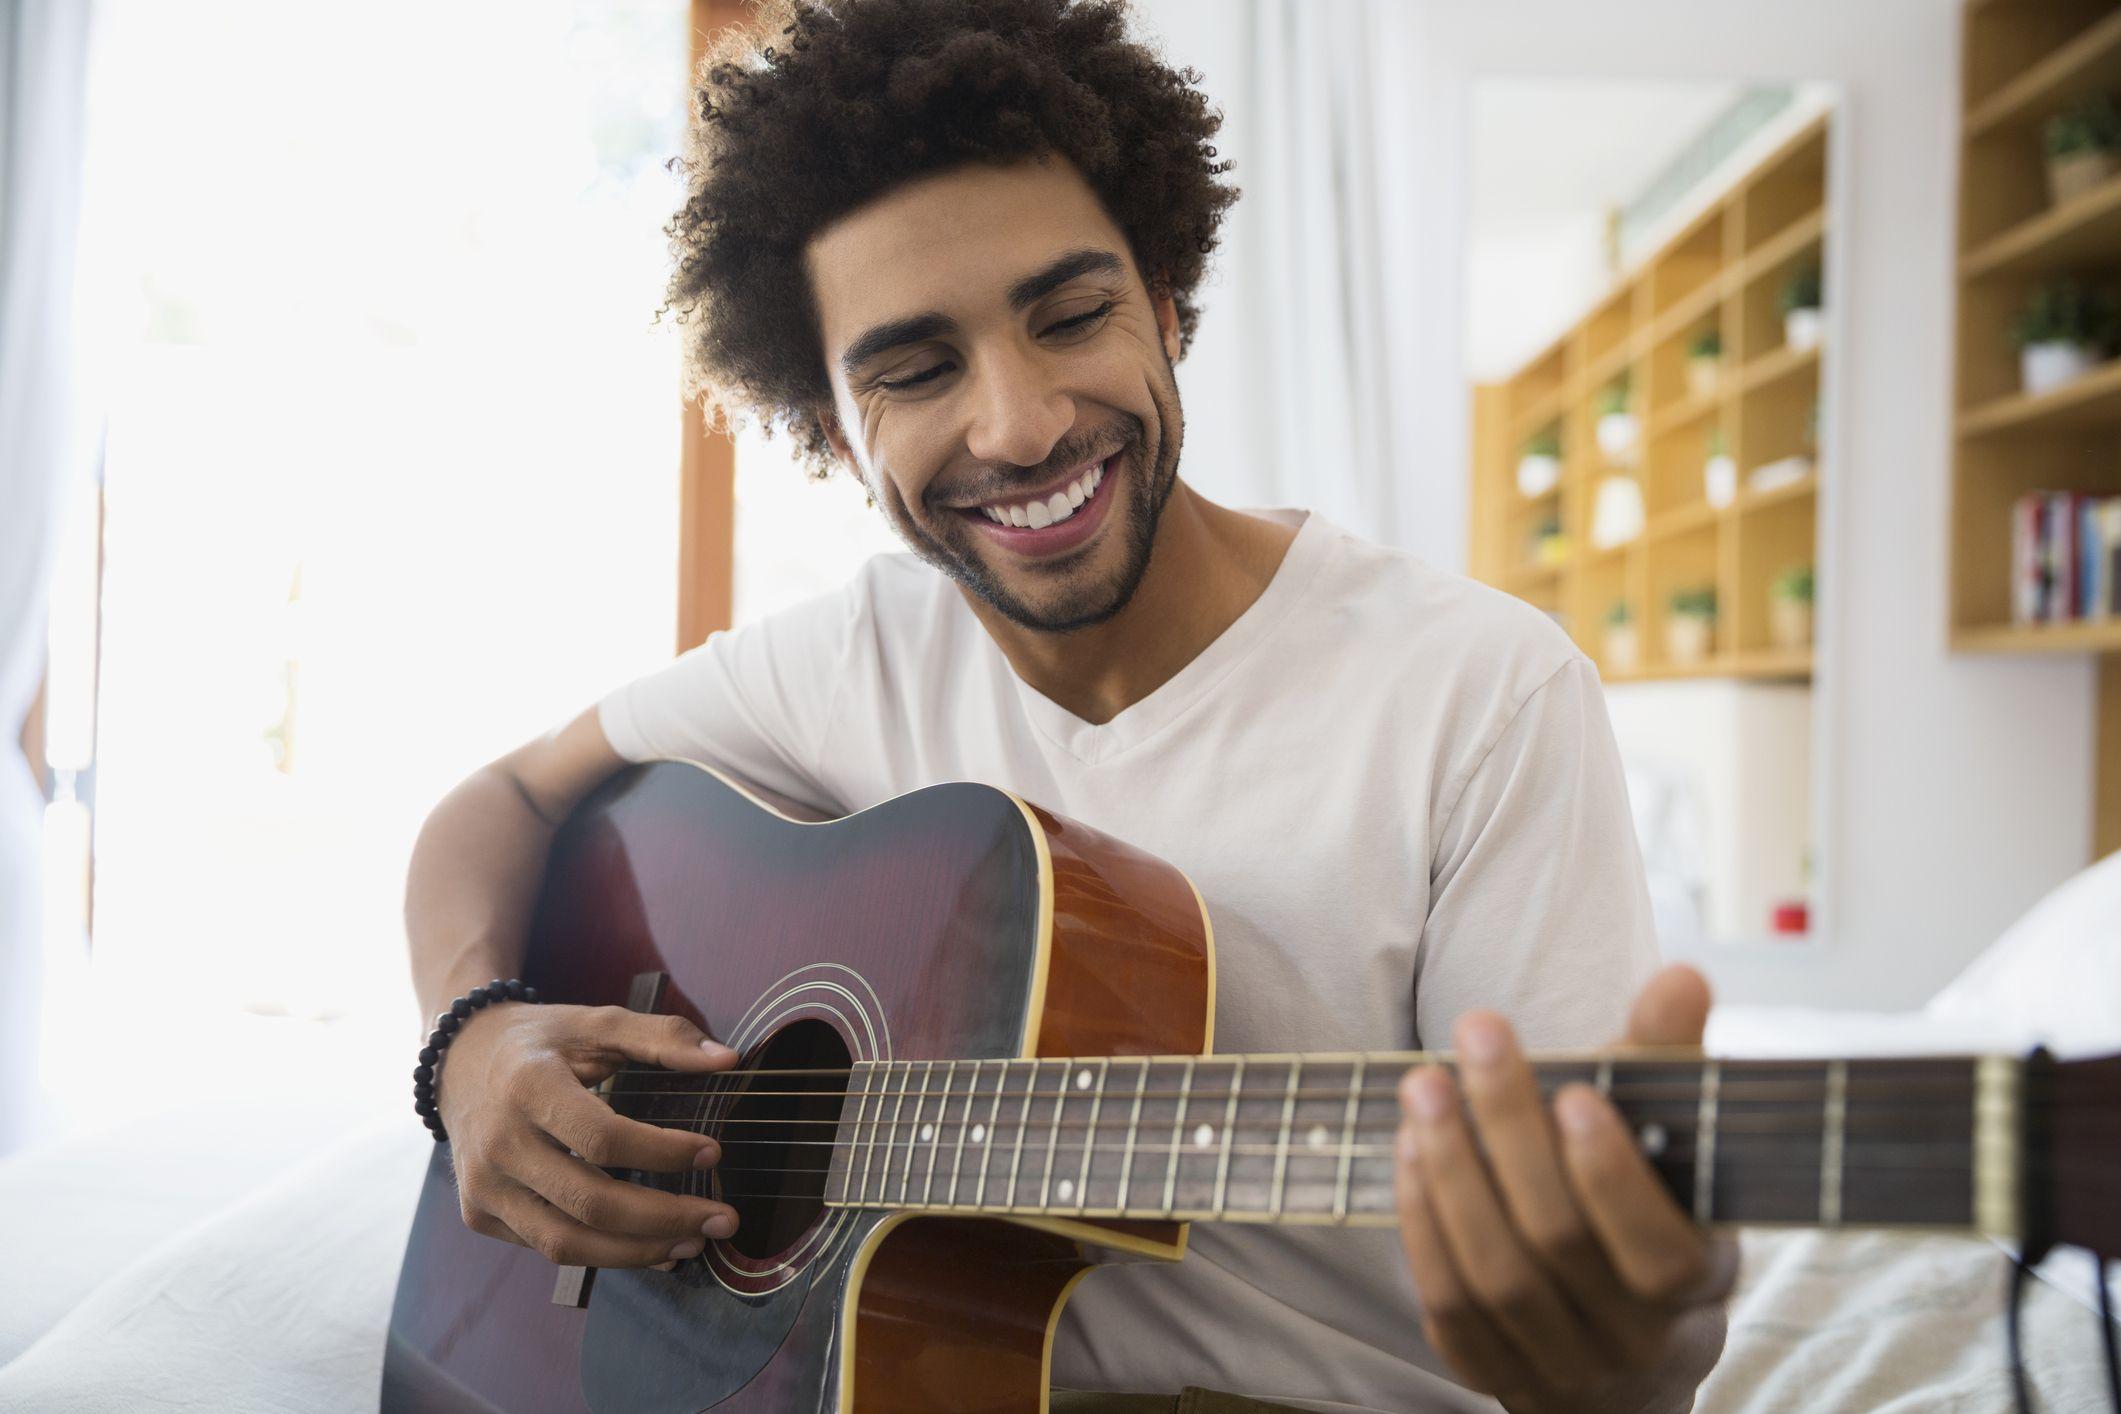 Smiling man playing guitar in bedroom